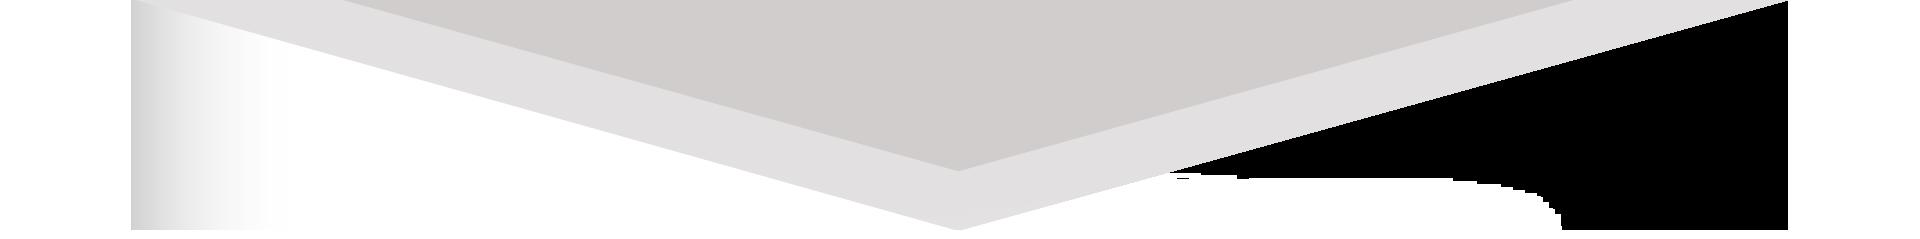 ci4829-slider-banners